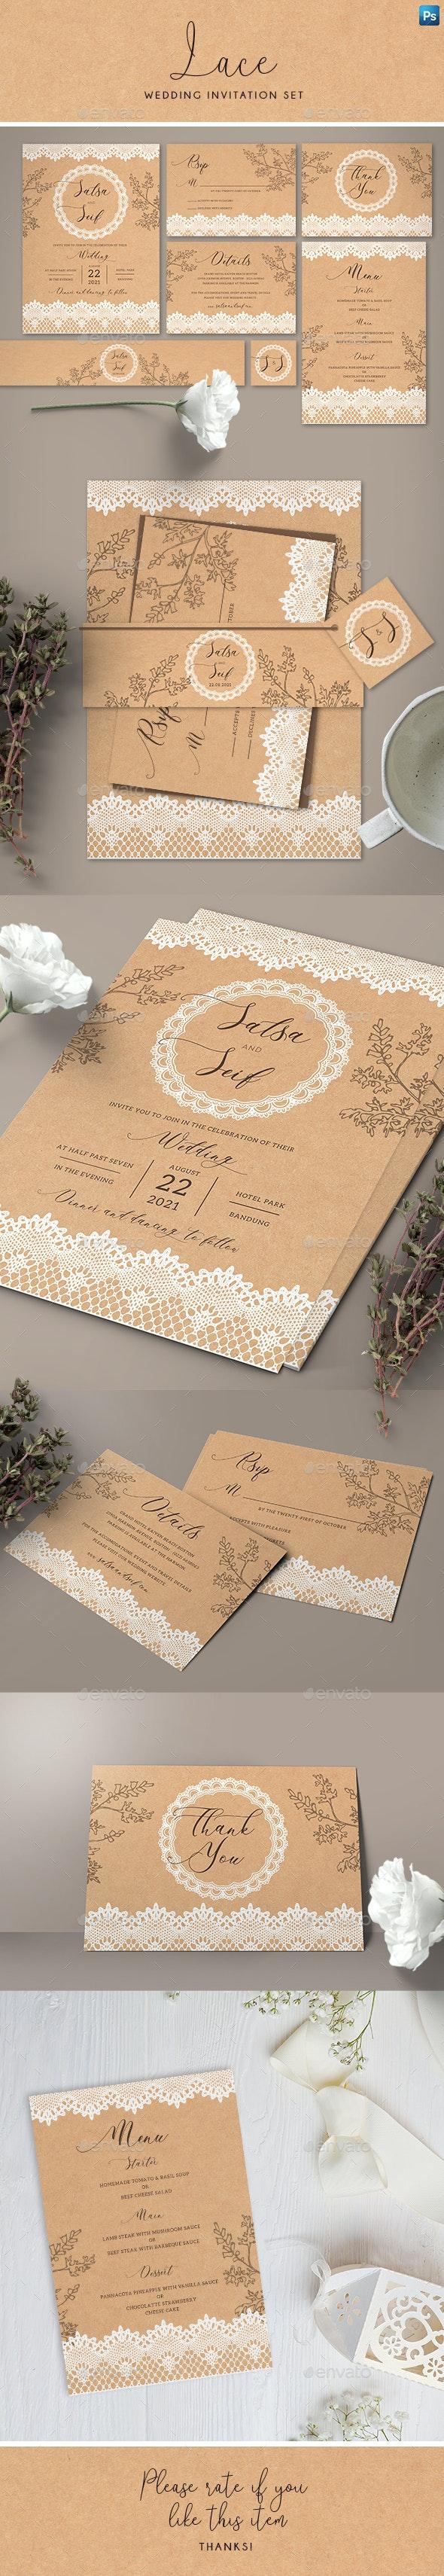 Lace Wedding Invitation Set - Weddings Cards & Invites